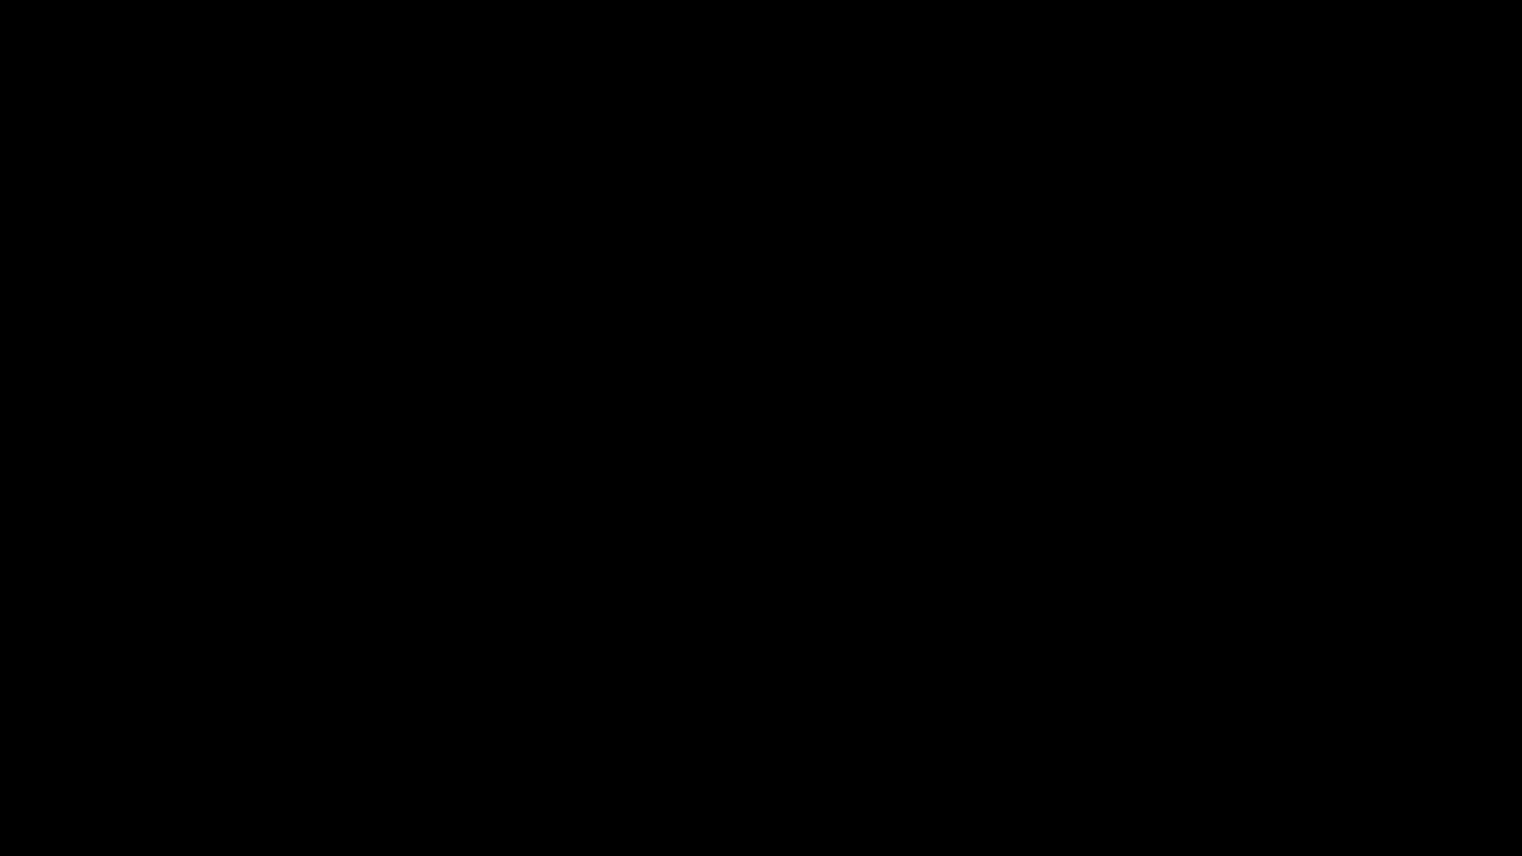 LINEA 1_Mesa de trabajo 1.png